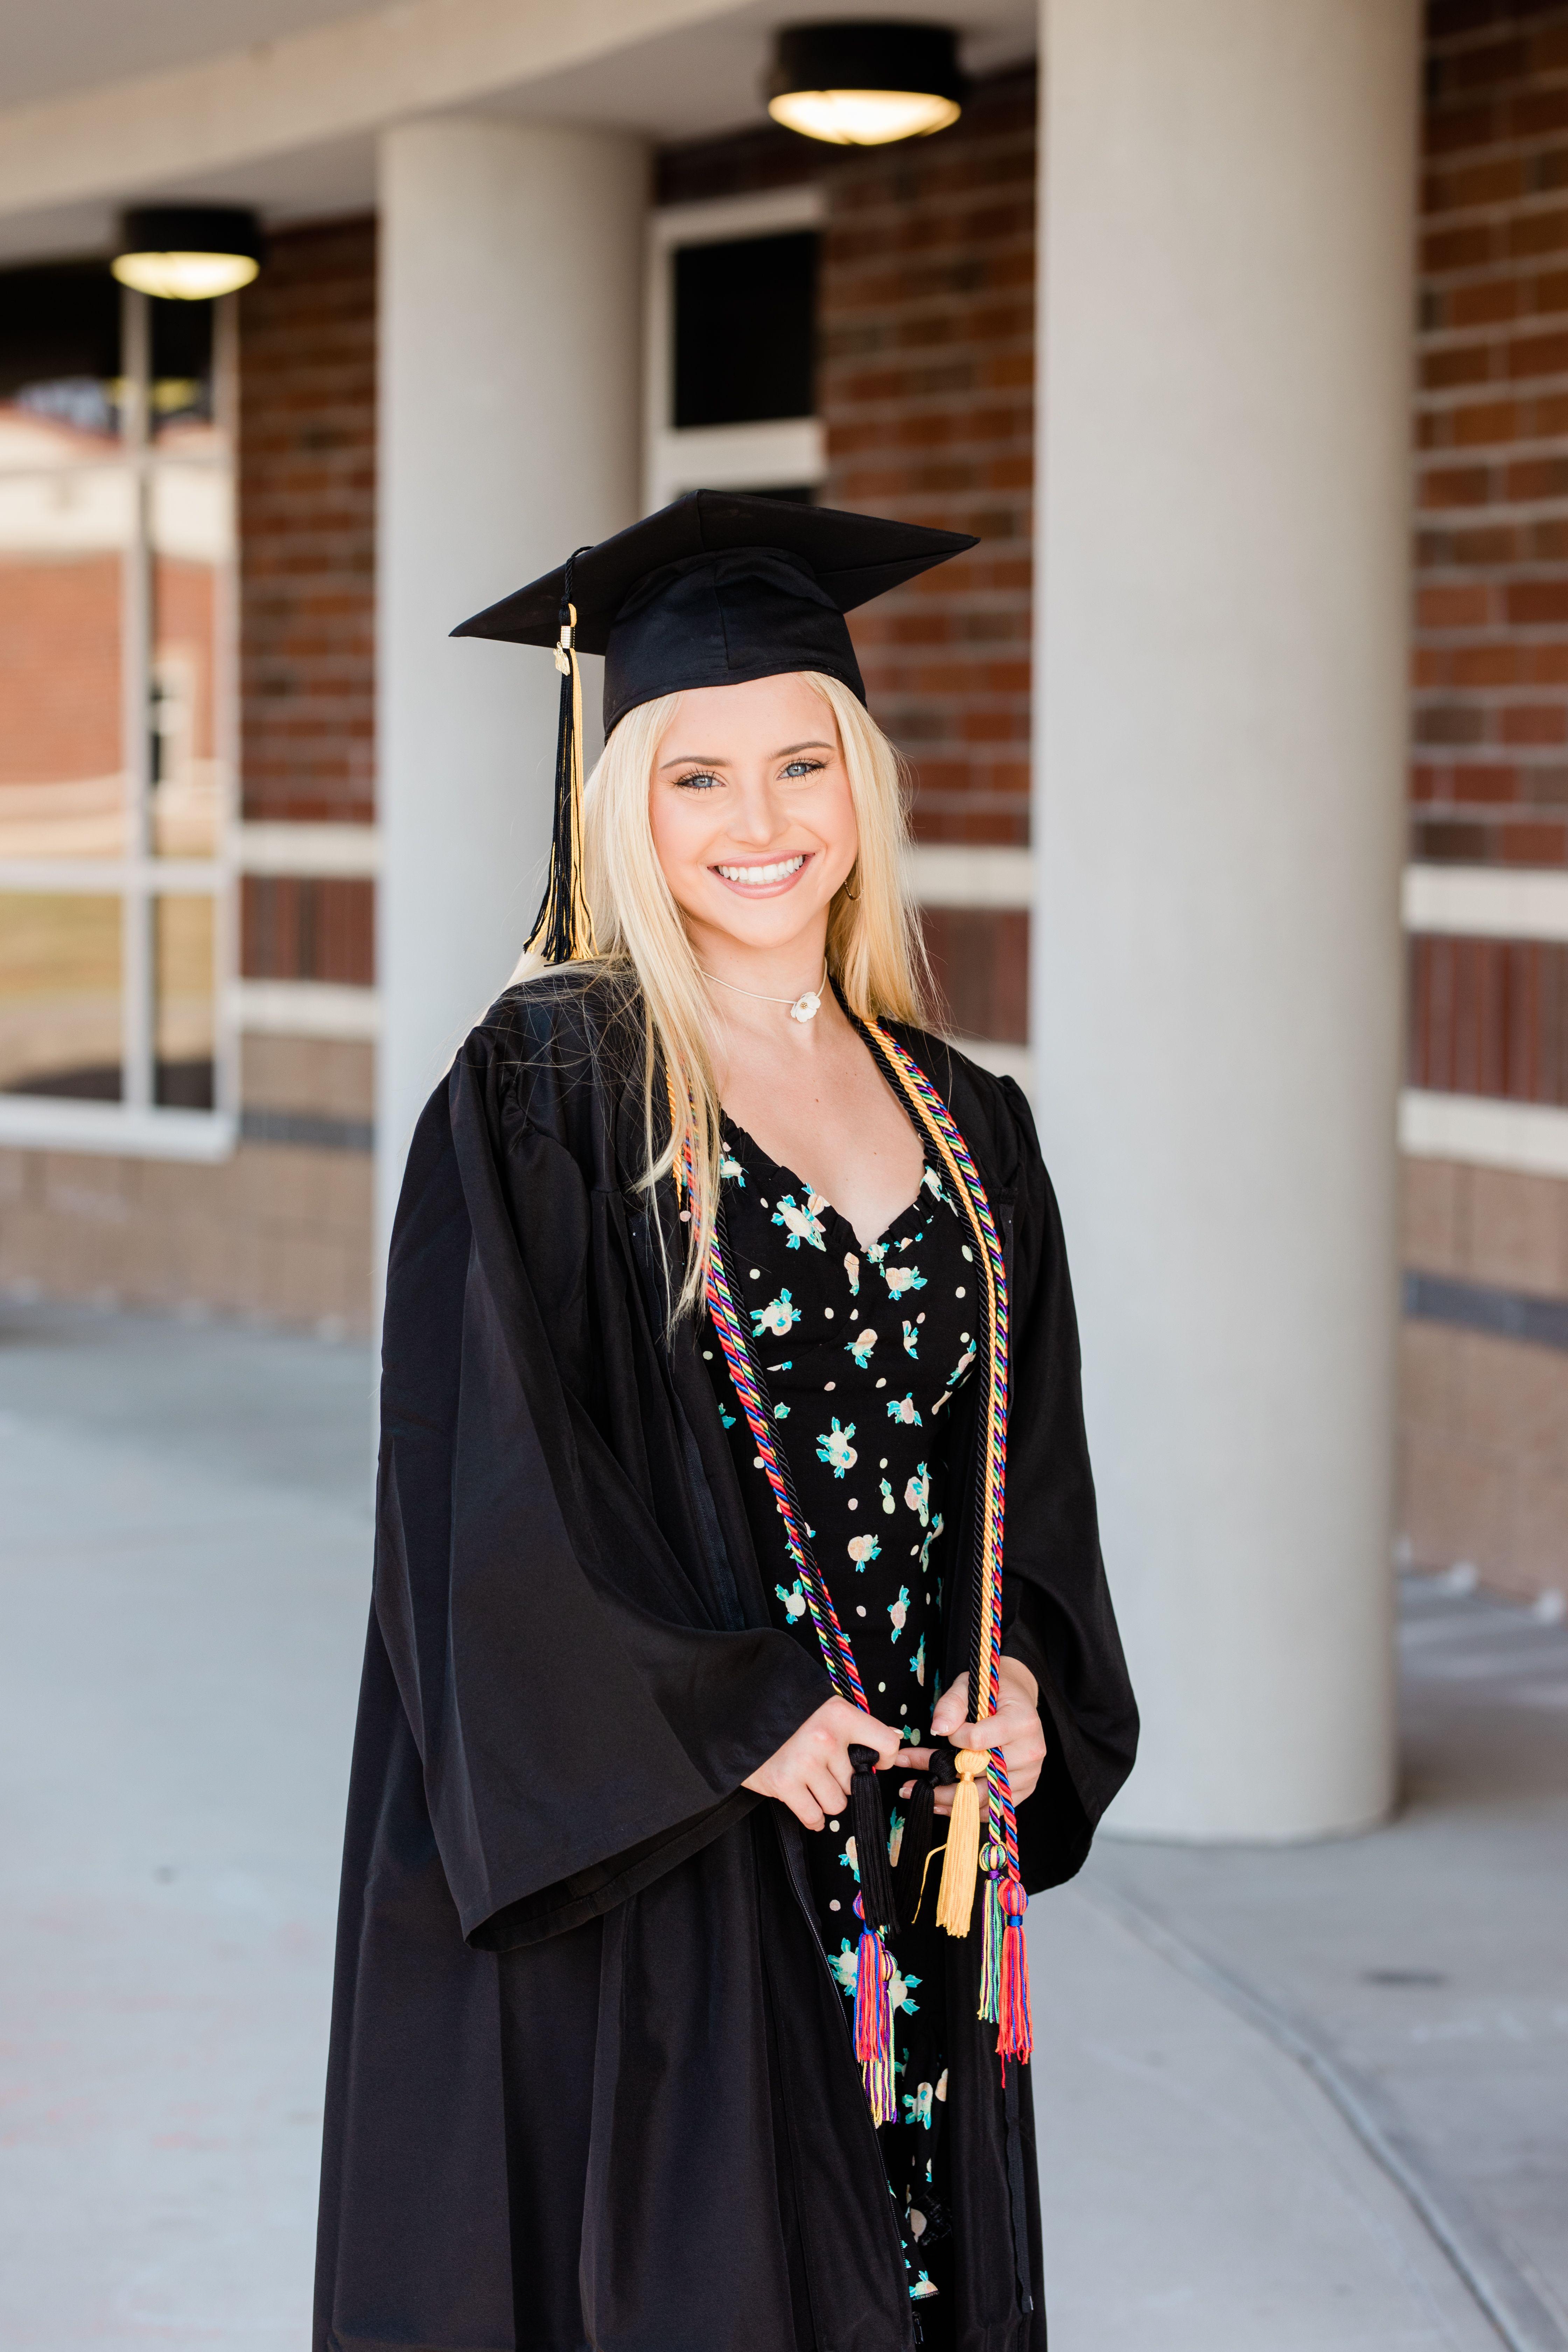 Senior-High-school_Photographer_Graduate-Graduation-Girl